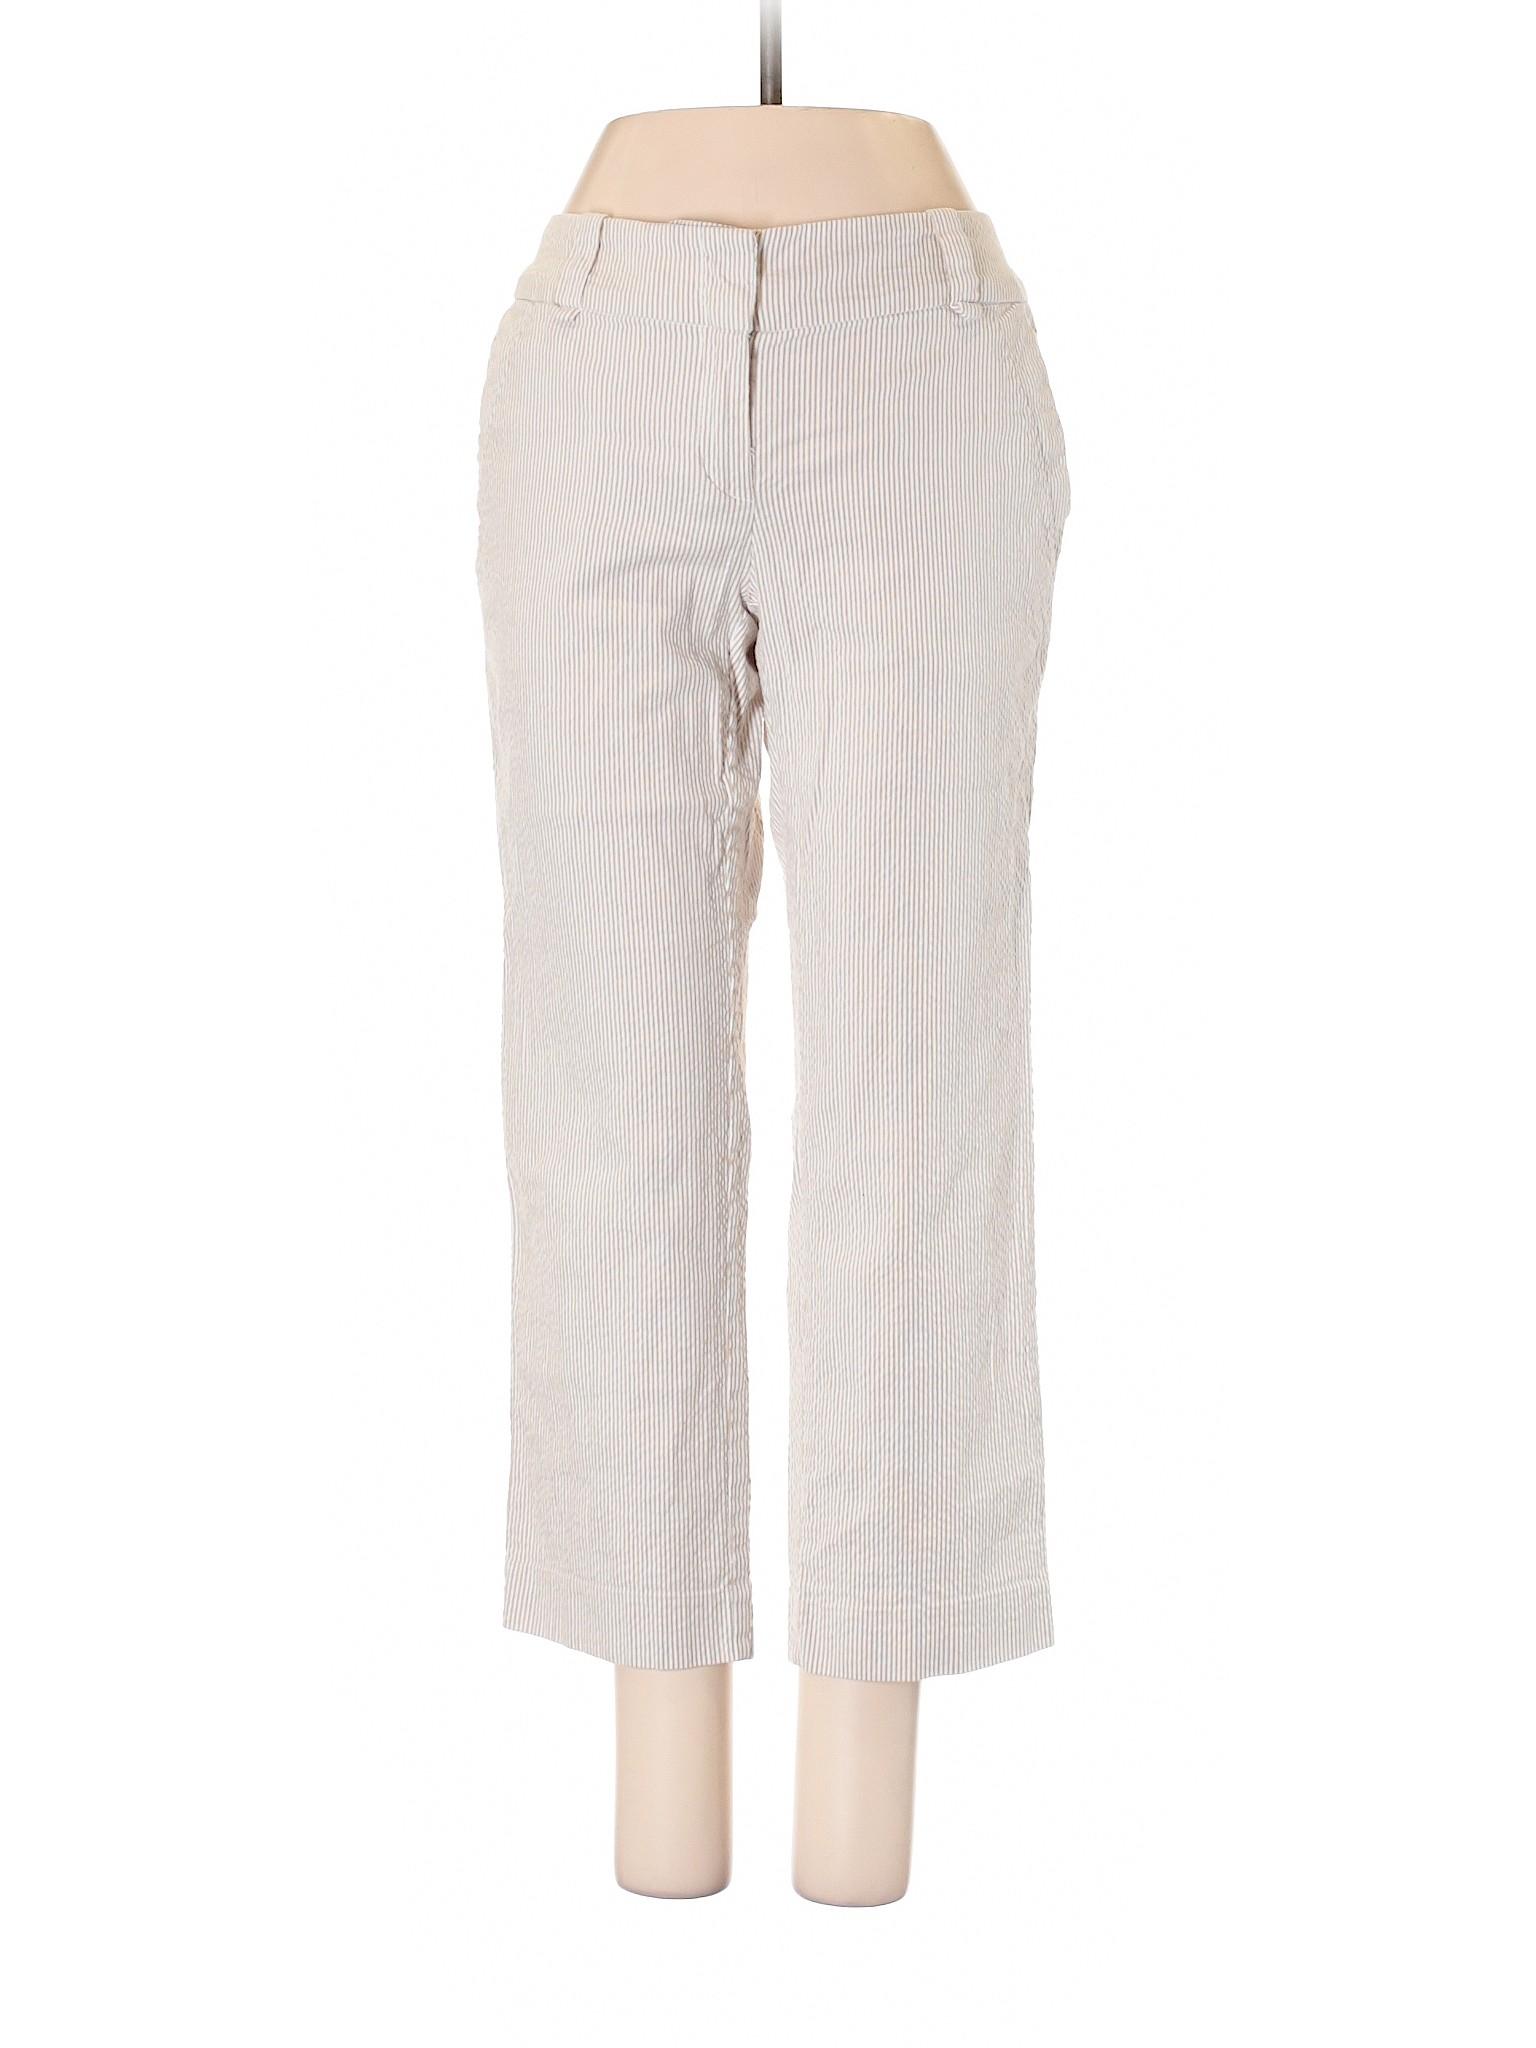 Dress York Leisure Company amp; winter New Pants wqx4TgO